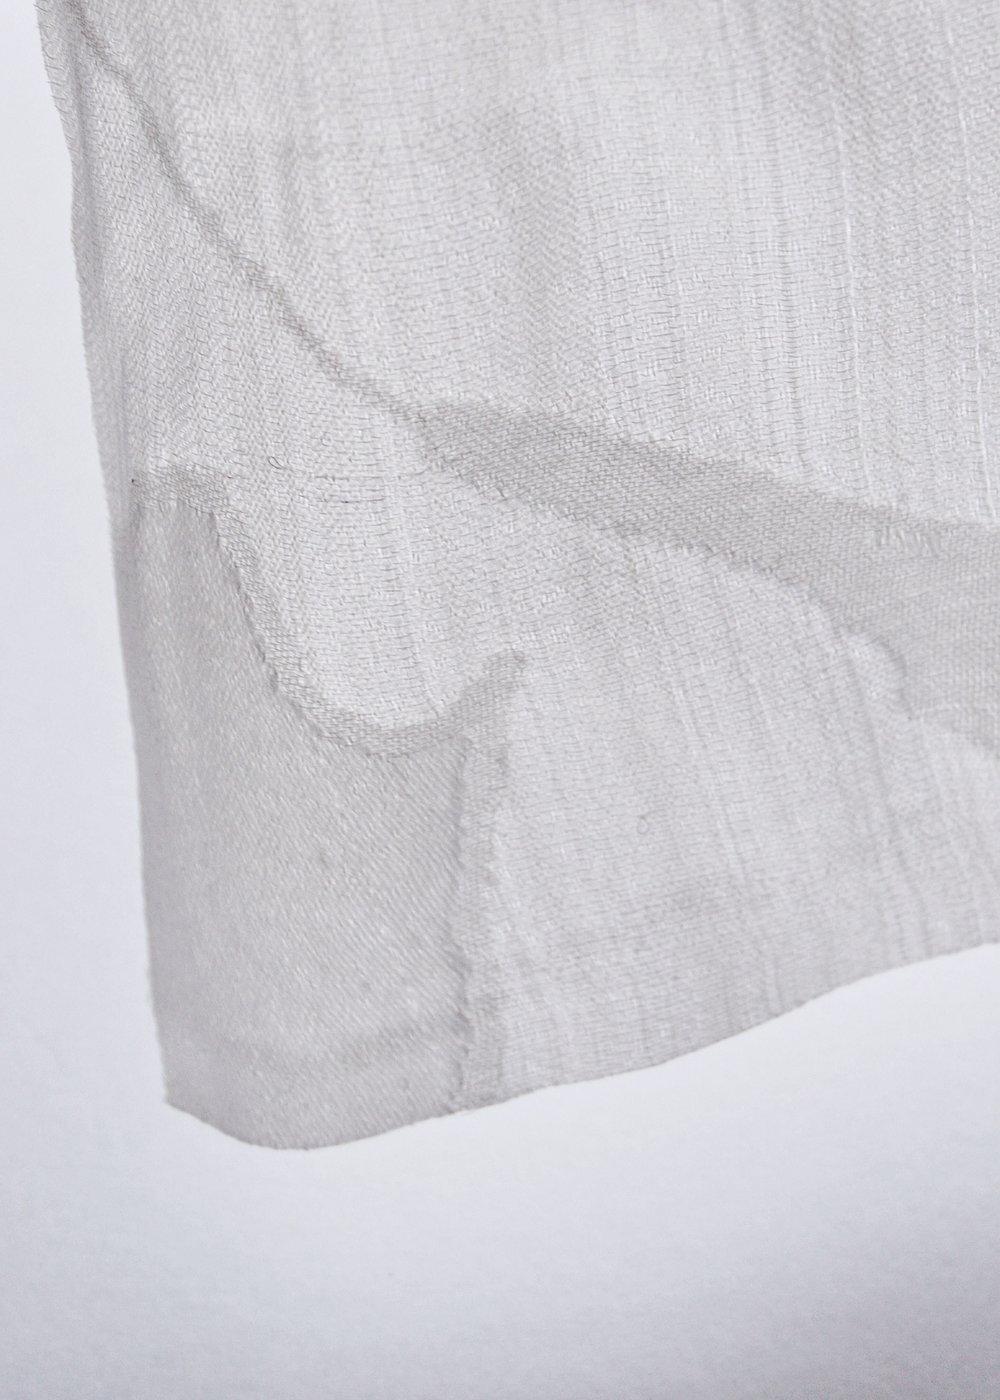 Jacquard fabric sample